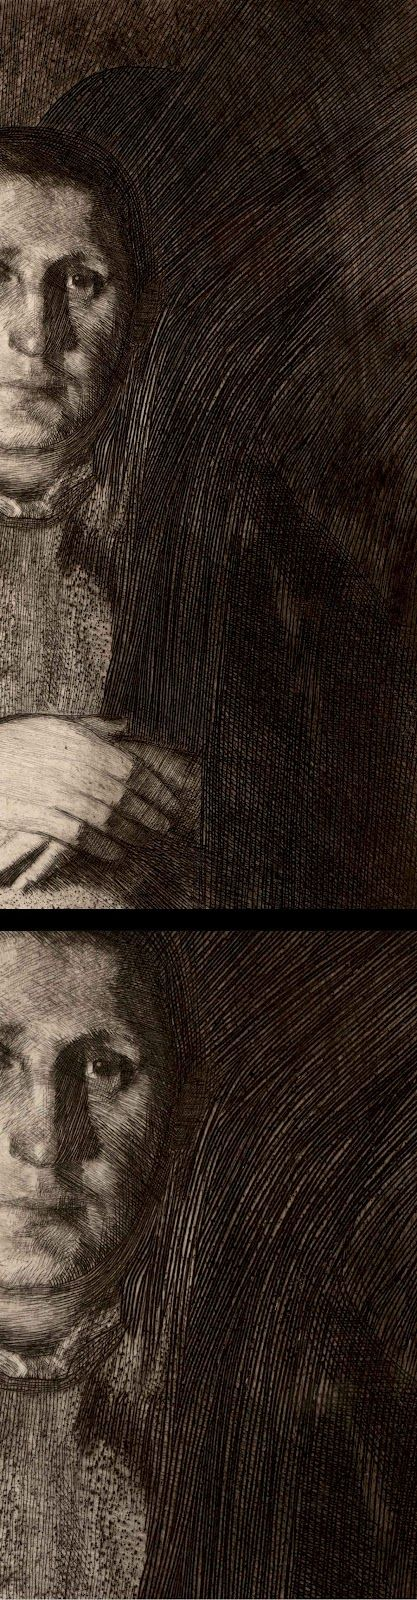 Käthe Kollwitz, (detail) #etching, dry point and soft ground